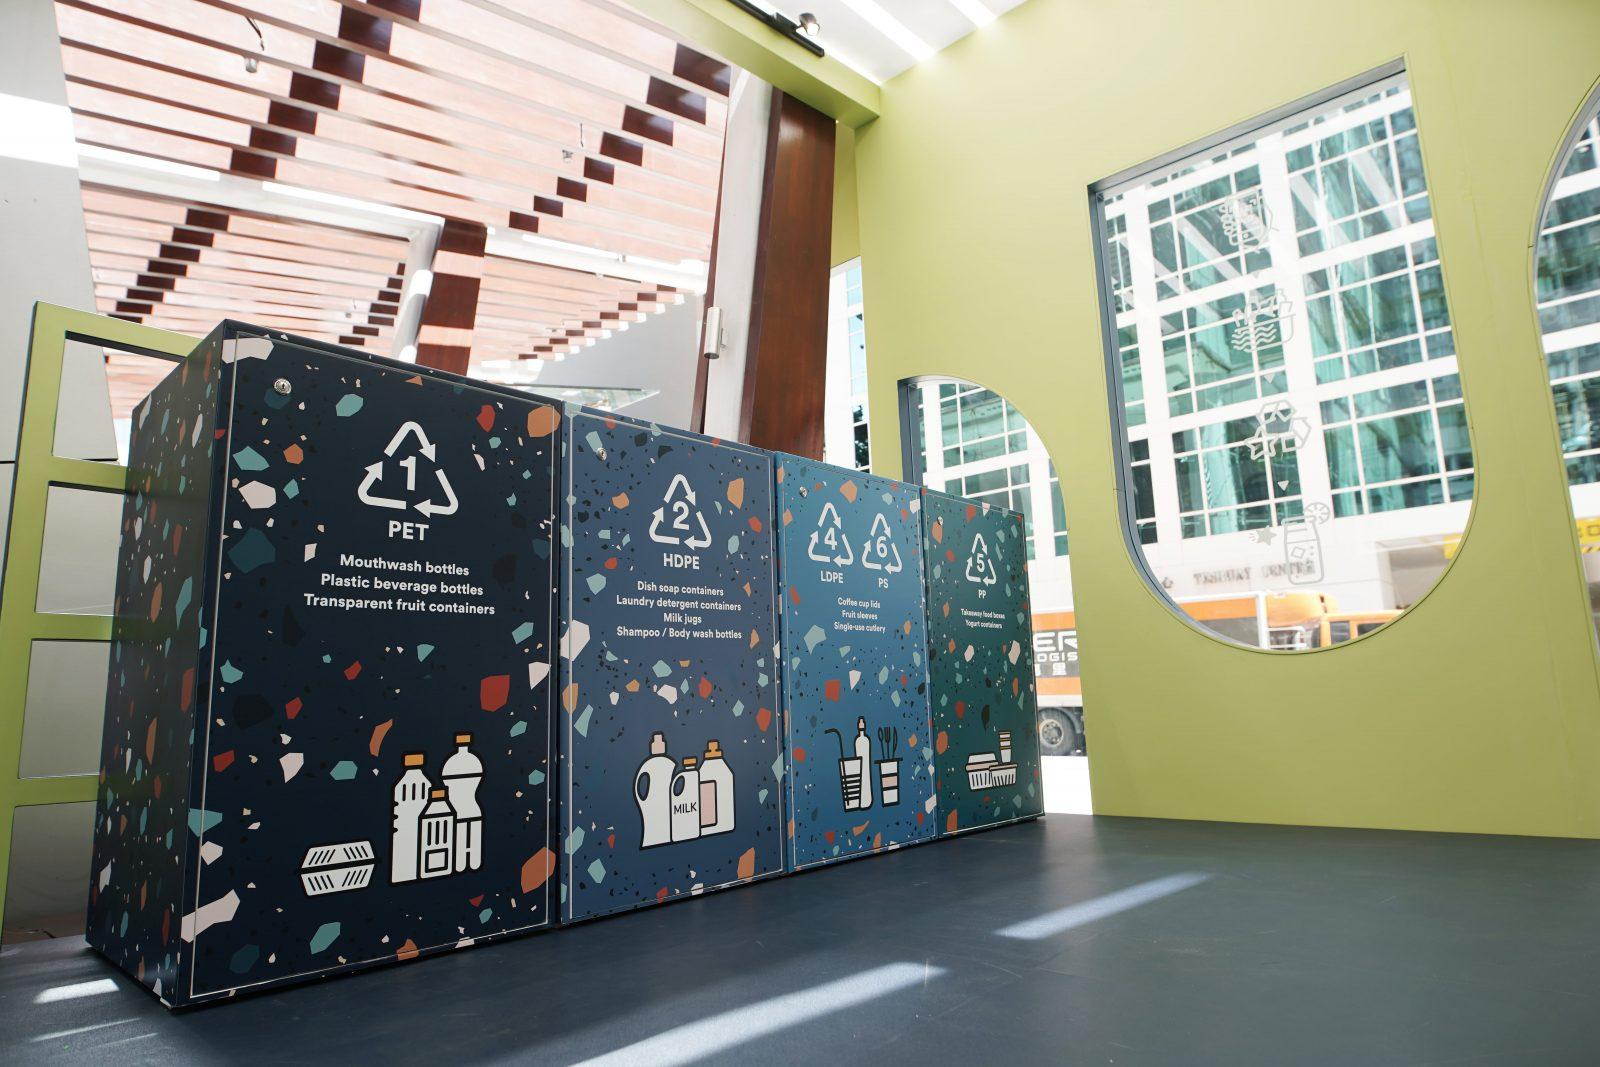 recycling bins at starstreet precinct